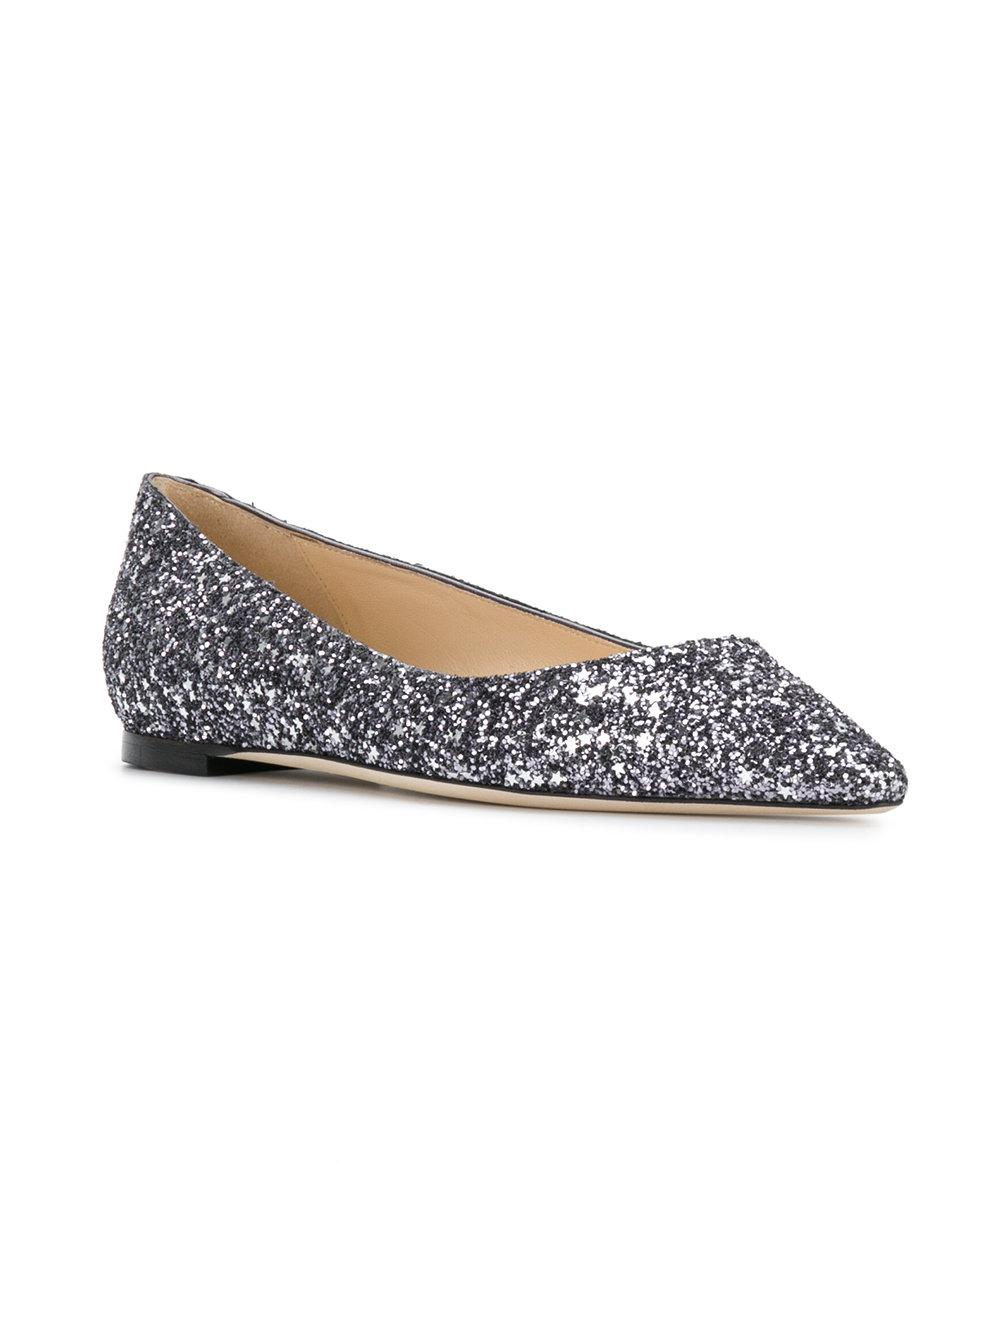 Exclusive to mytheresa.com - Romy Flat glitter ballerinas Jimmy Choo London 4nOU4id